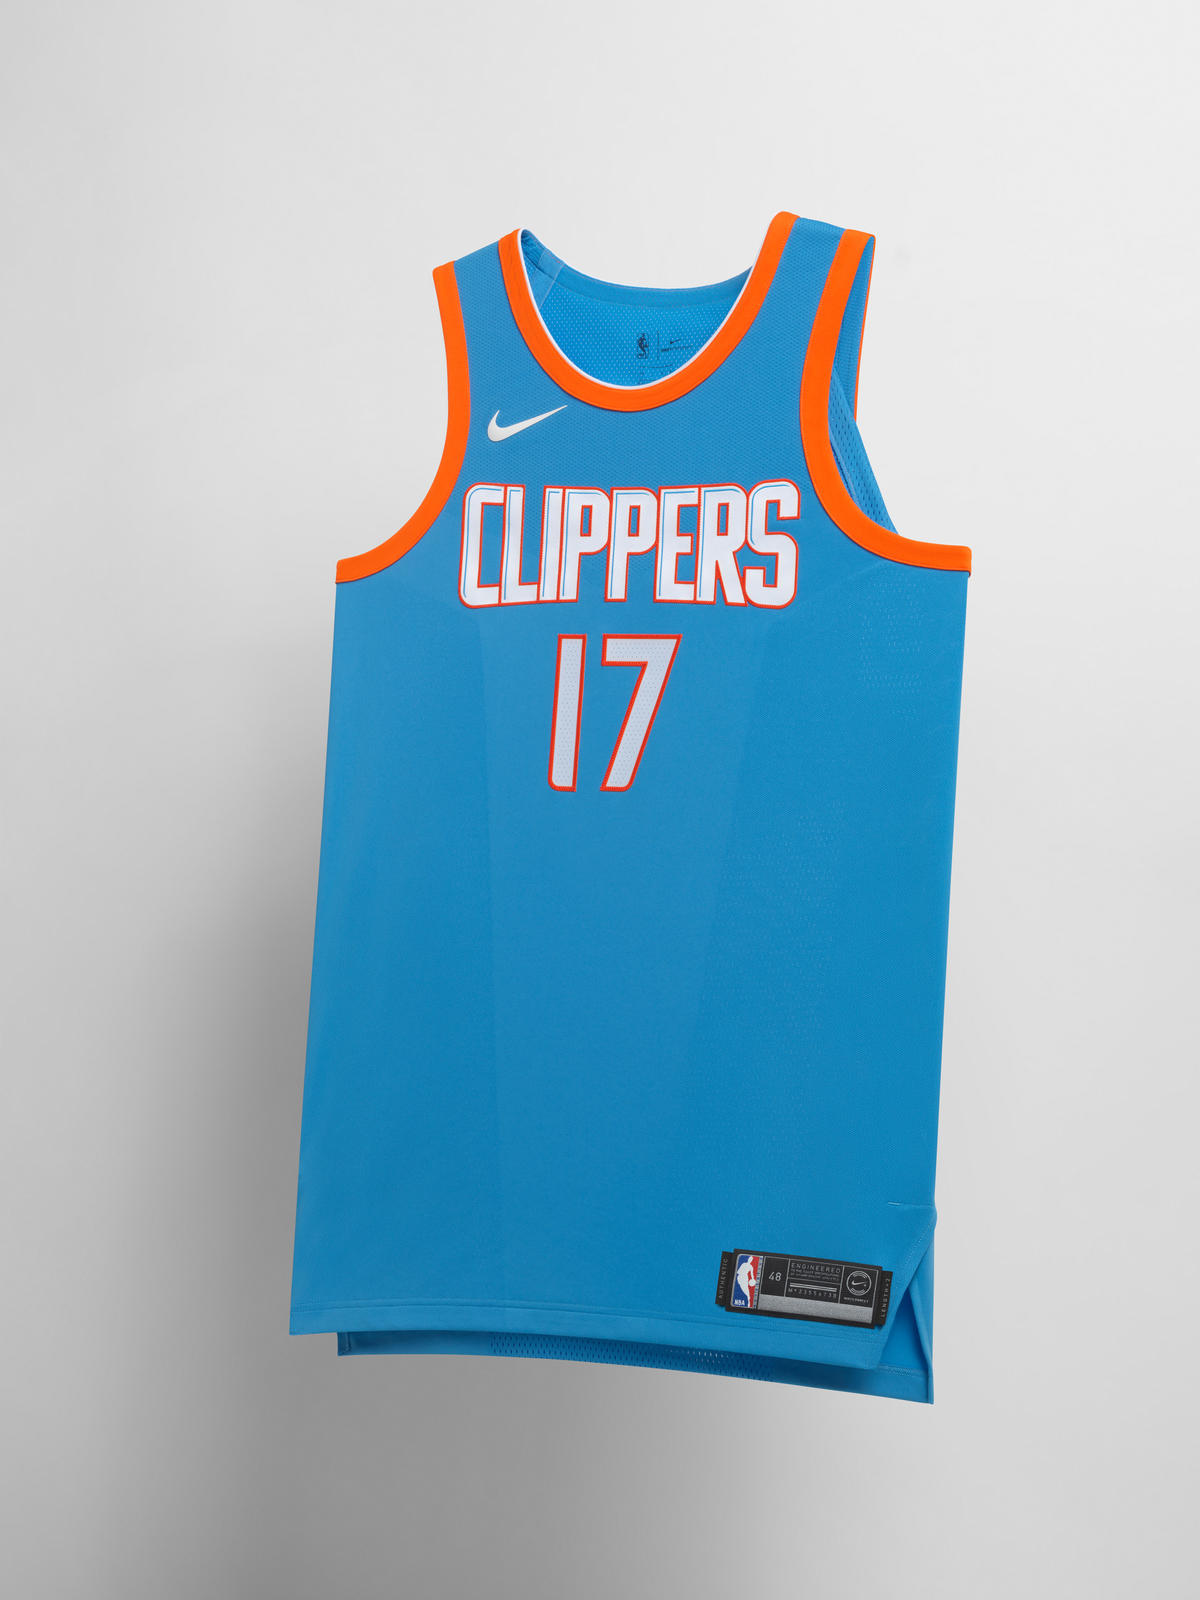 Nike_NBA_City_Edition_Uniform_LA_Clippers_0133_native_1600